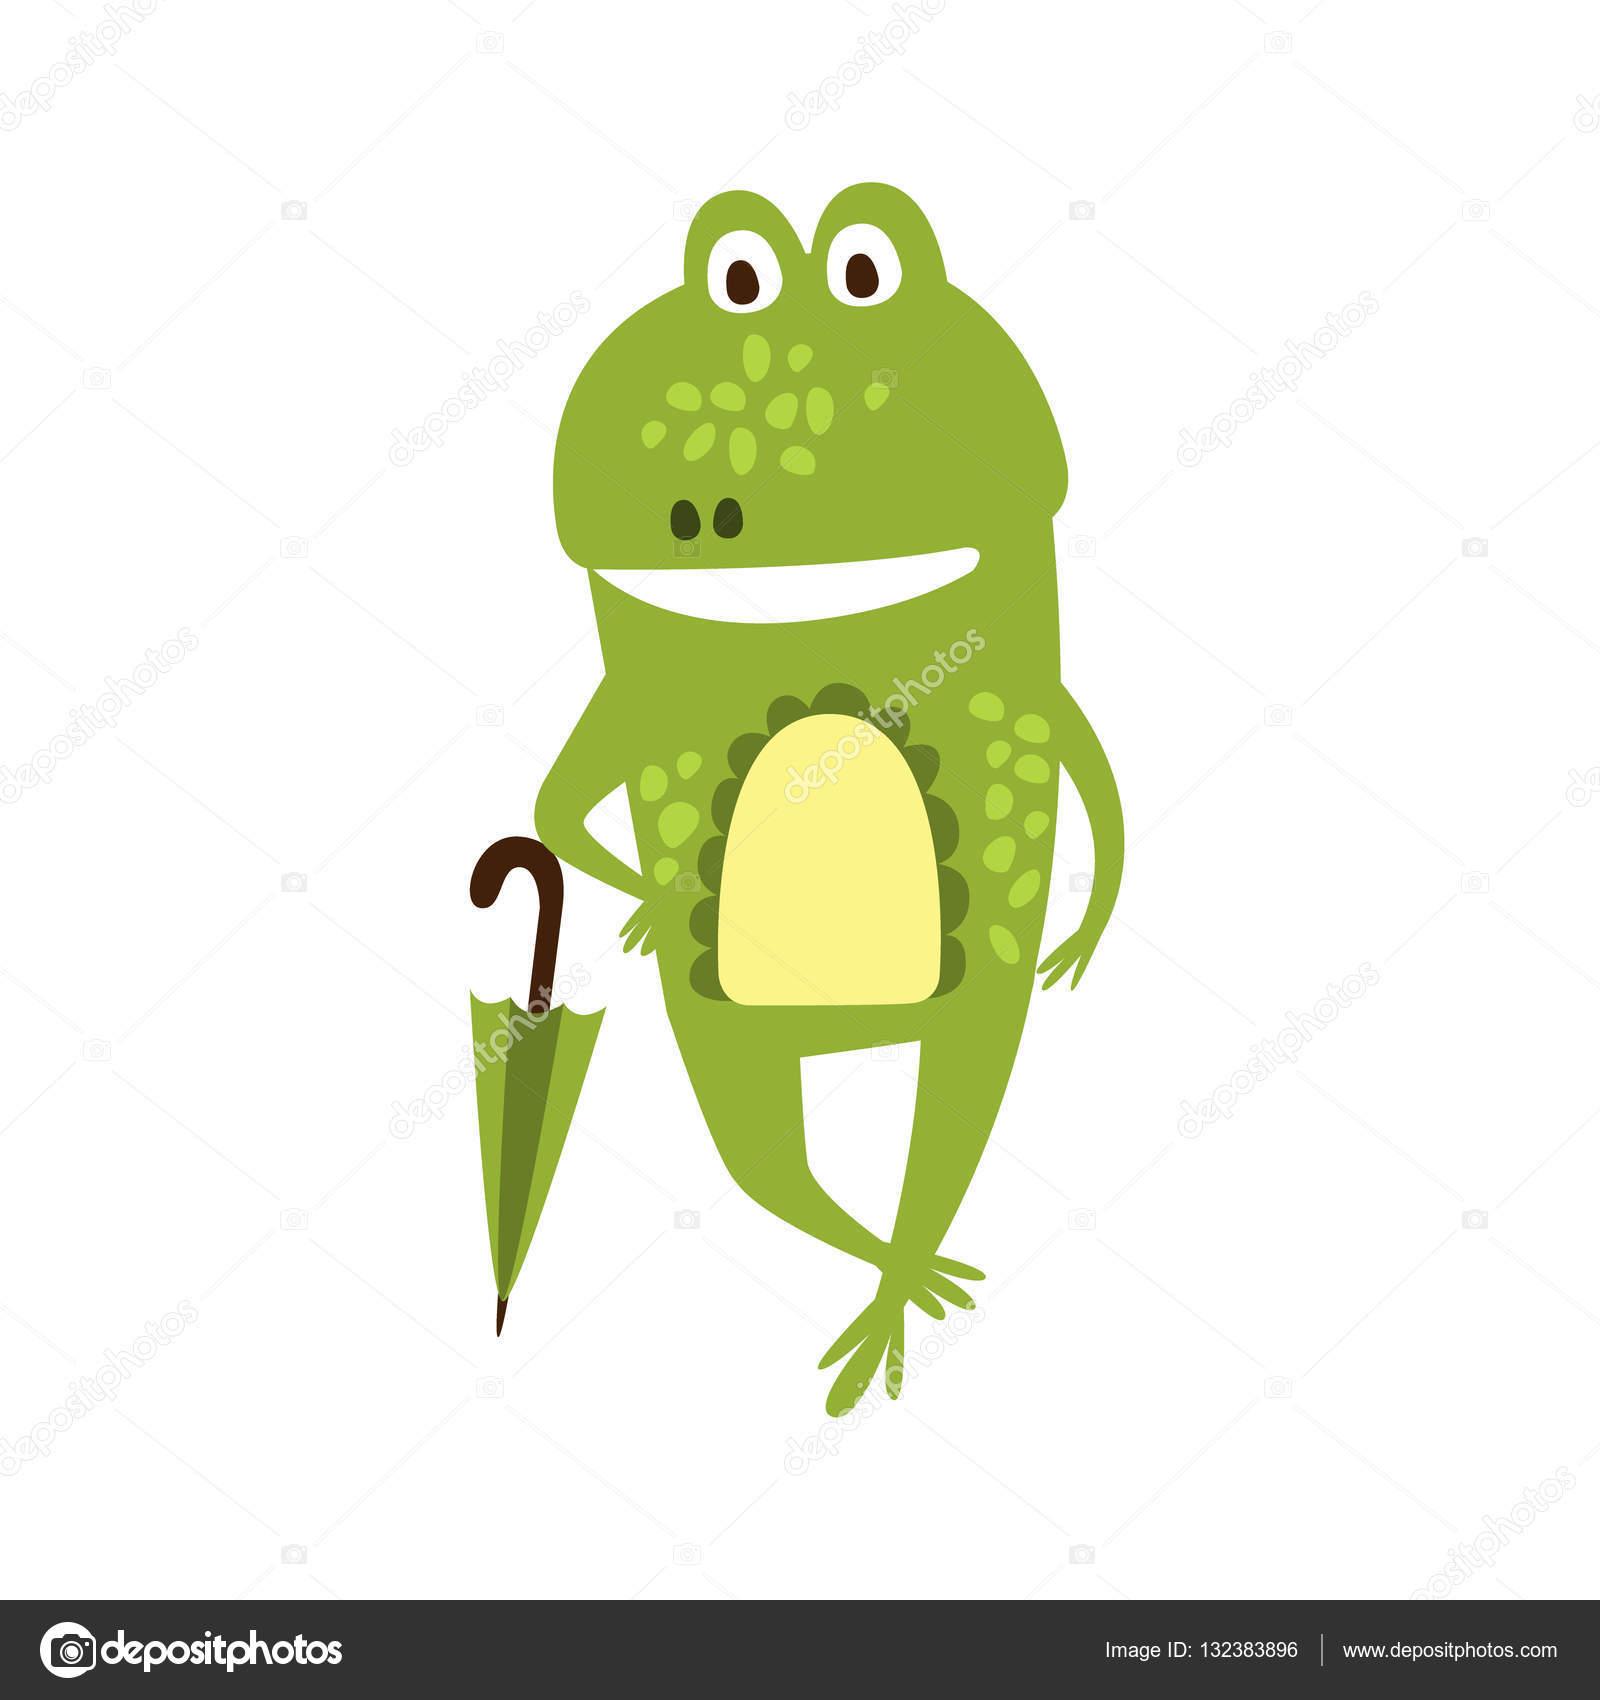 frog with umbrella flat cartoon green friendly reptile animal